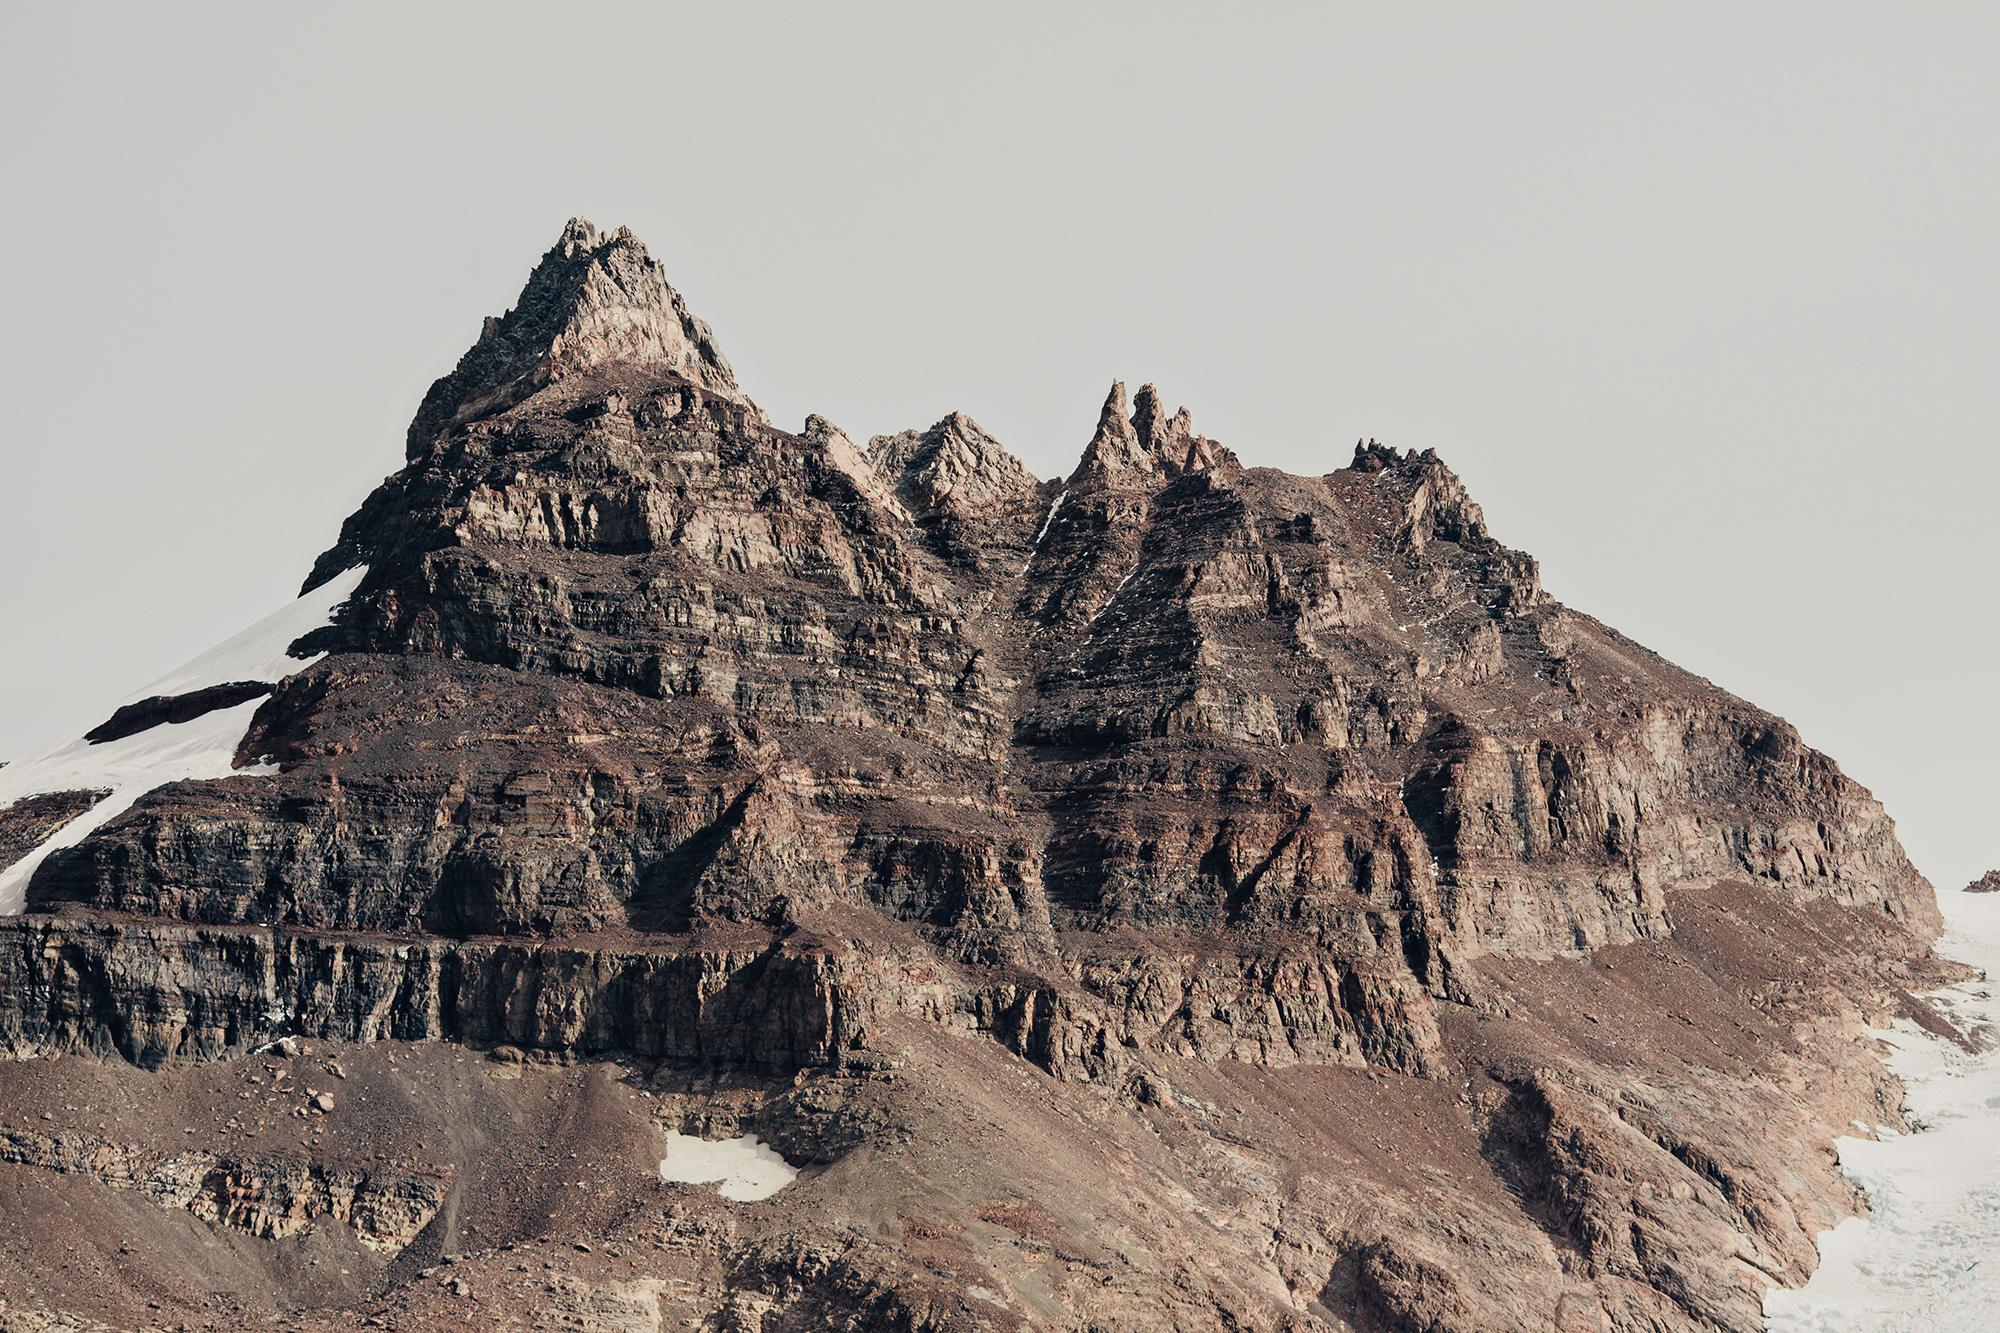 Fitzroy-range-argentina-photography-0011.jpg